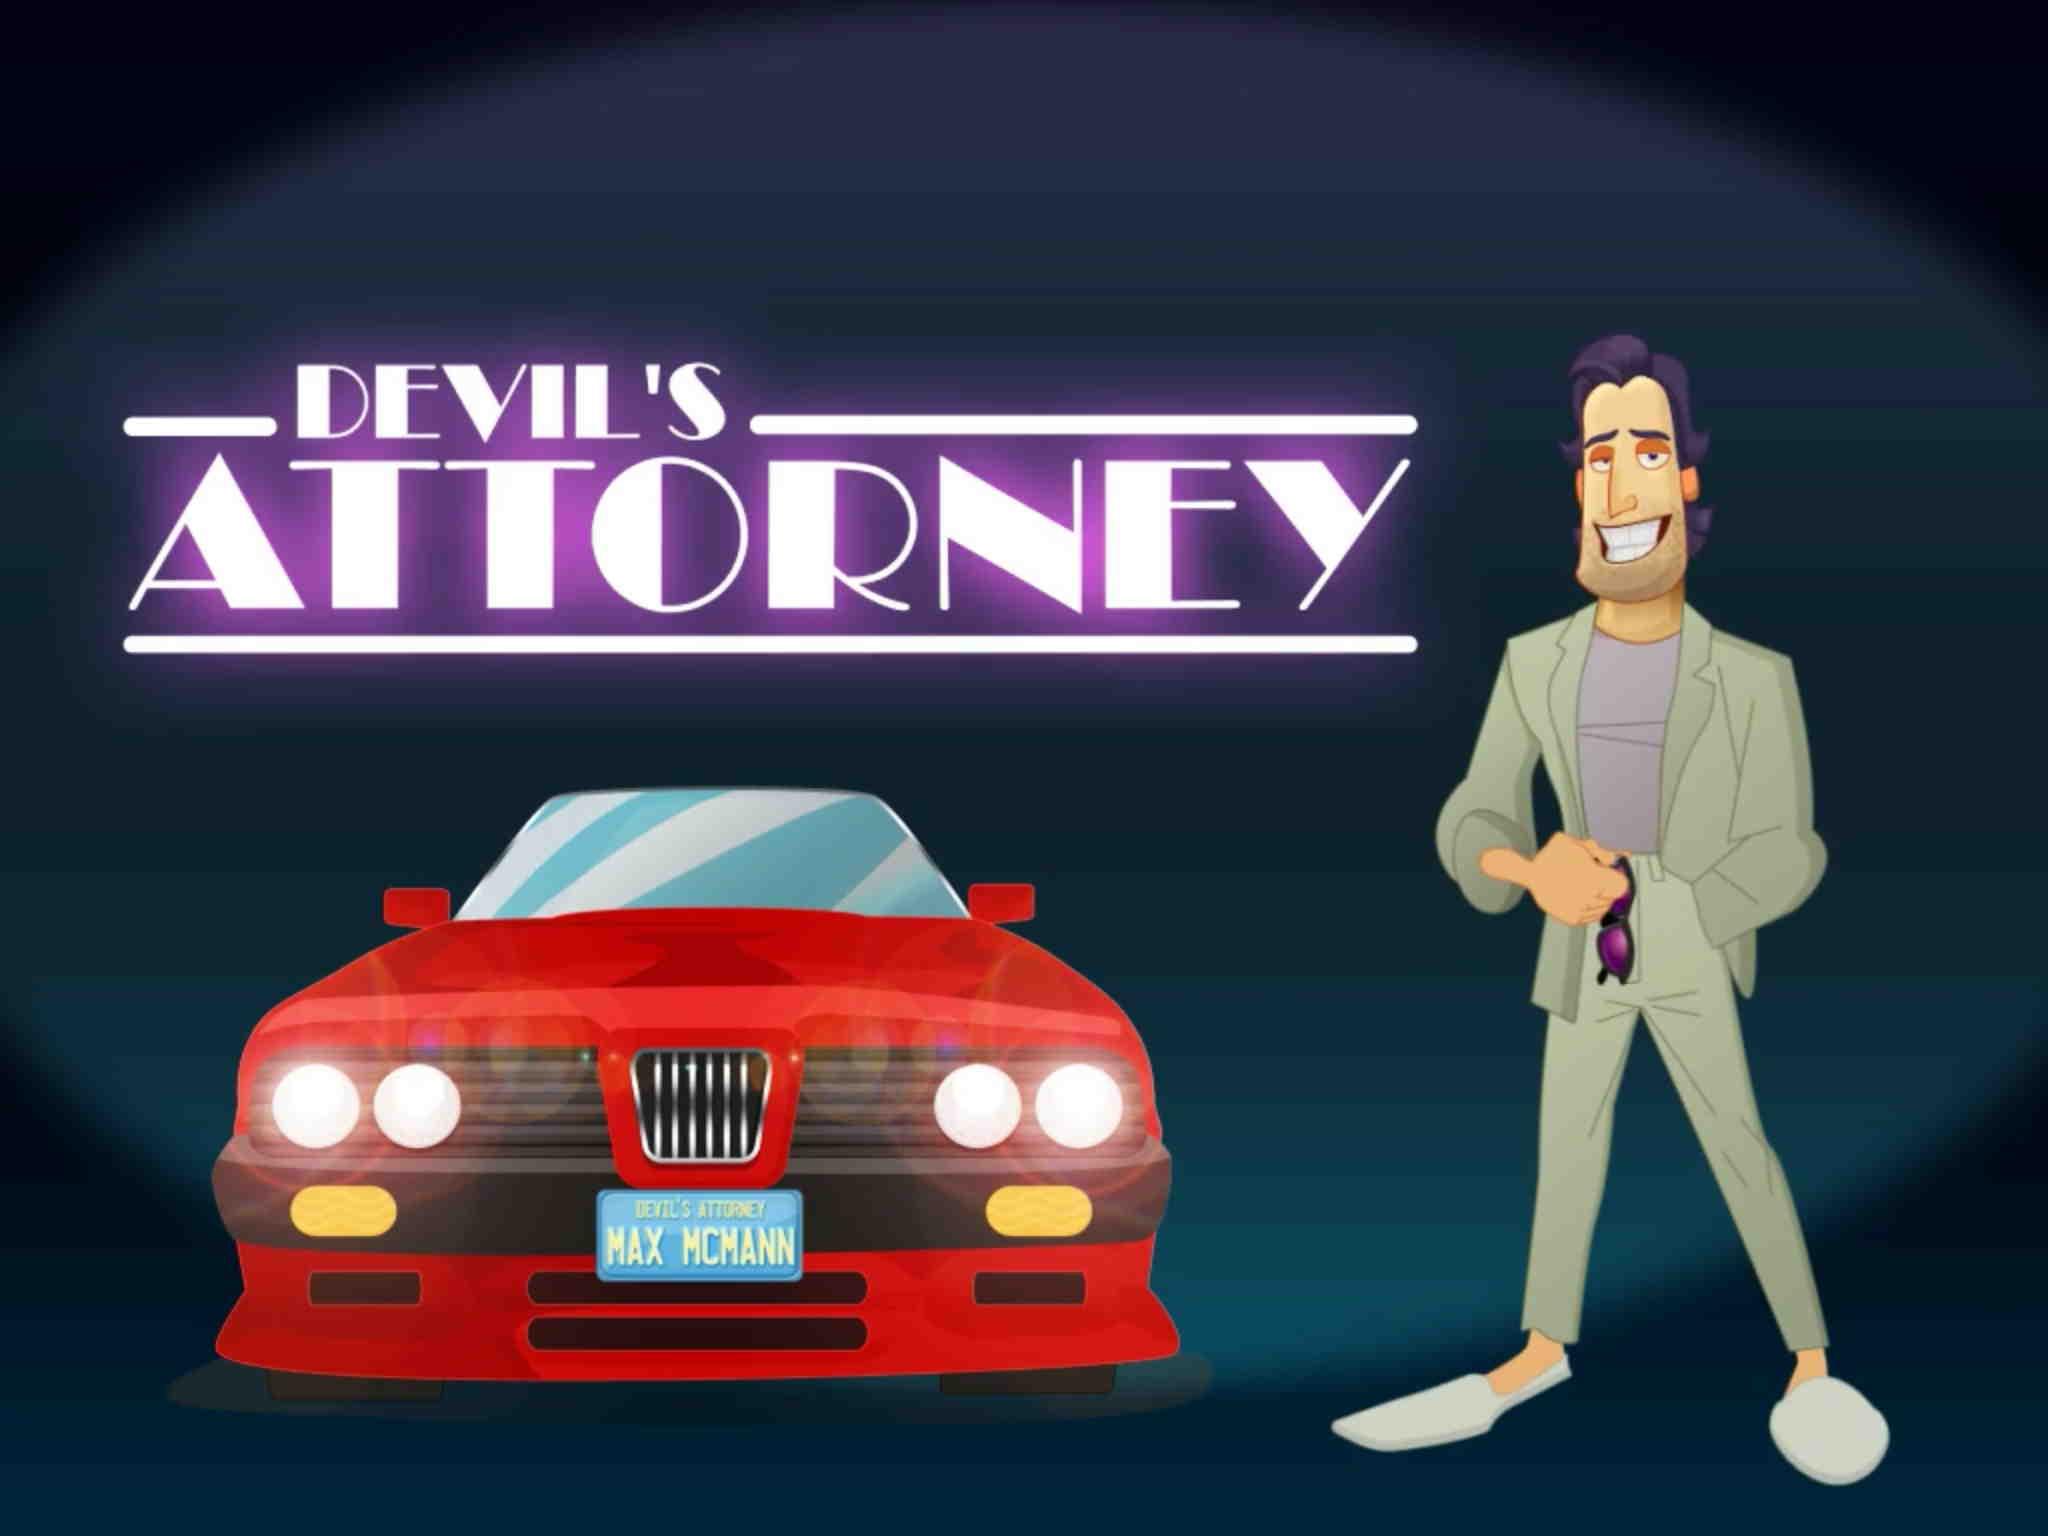 Devils_Attorney_01